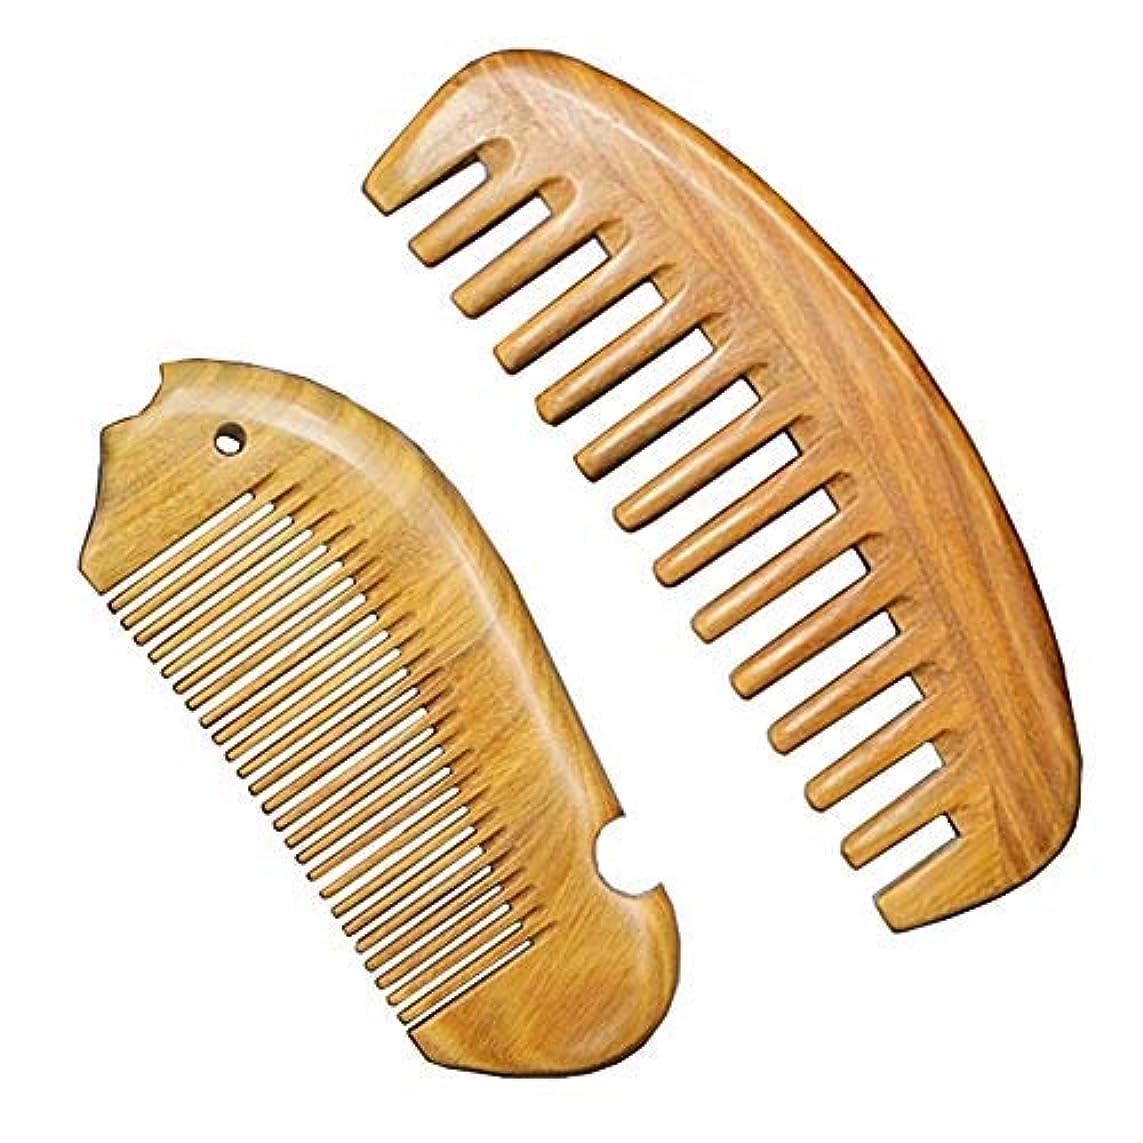 Sandalwood Hair Combs Set - Anti-Static Sandalwood Scent Natural Hair Detangler Wooden Comb (Wide Tooth & Fine...